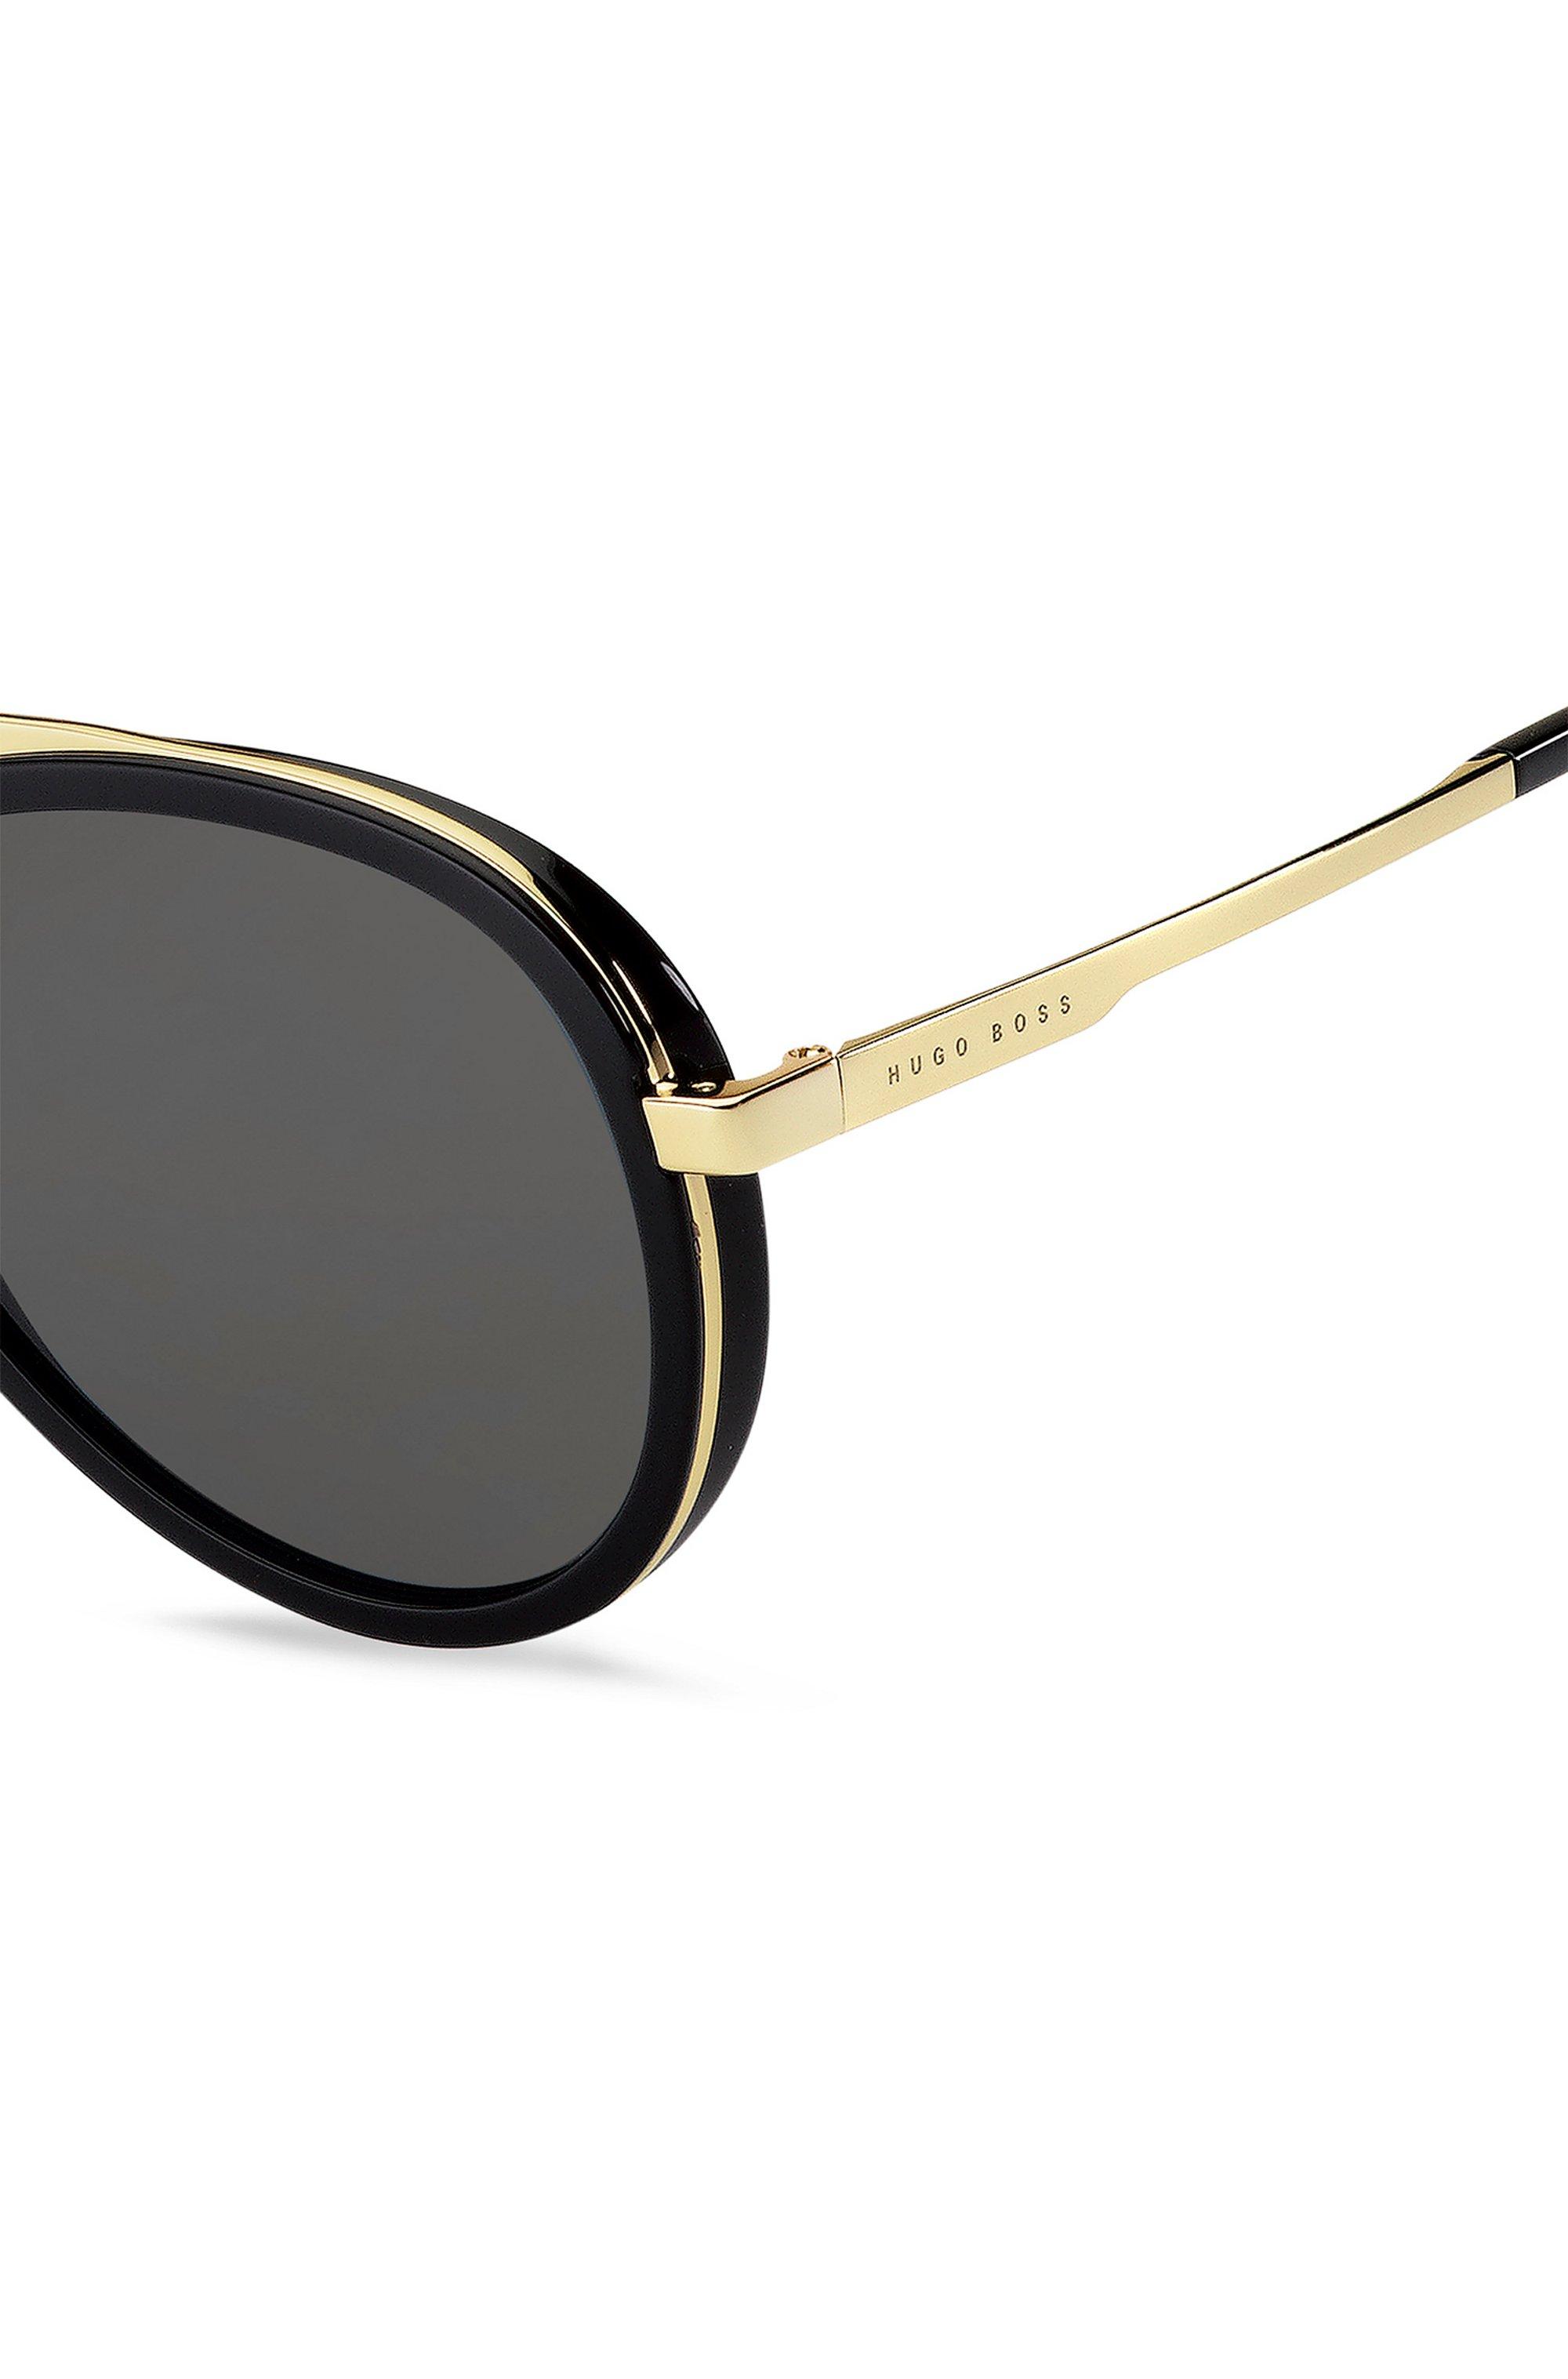 Triple-bridge sunglasses with black and gold-tone frames